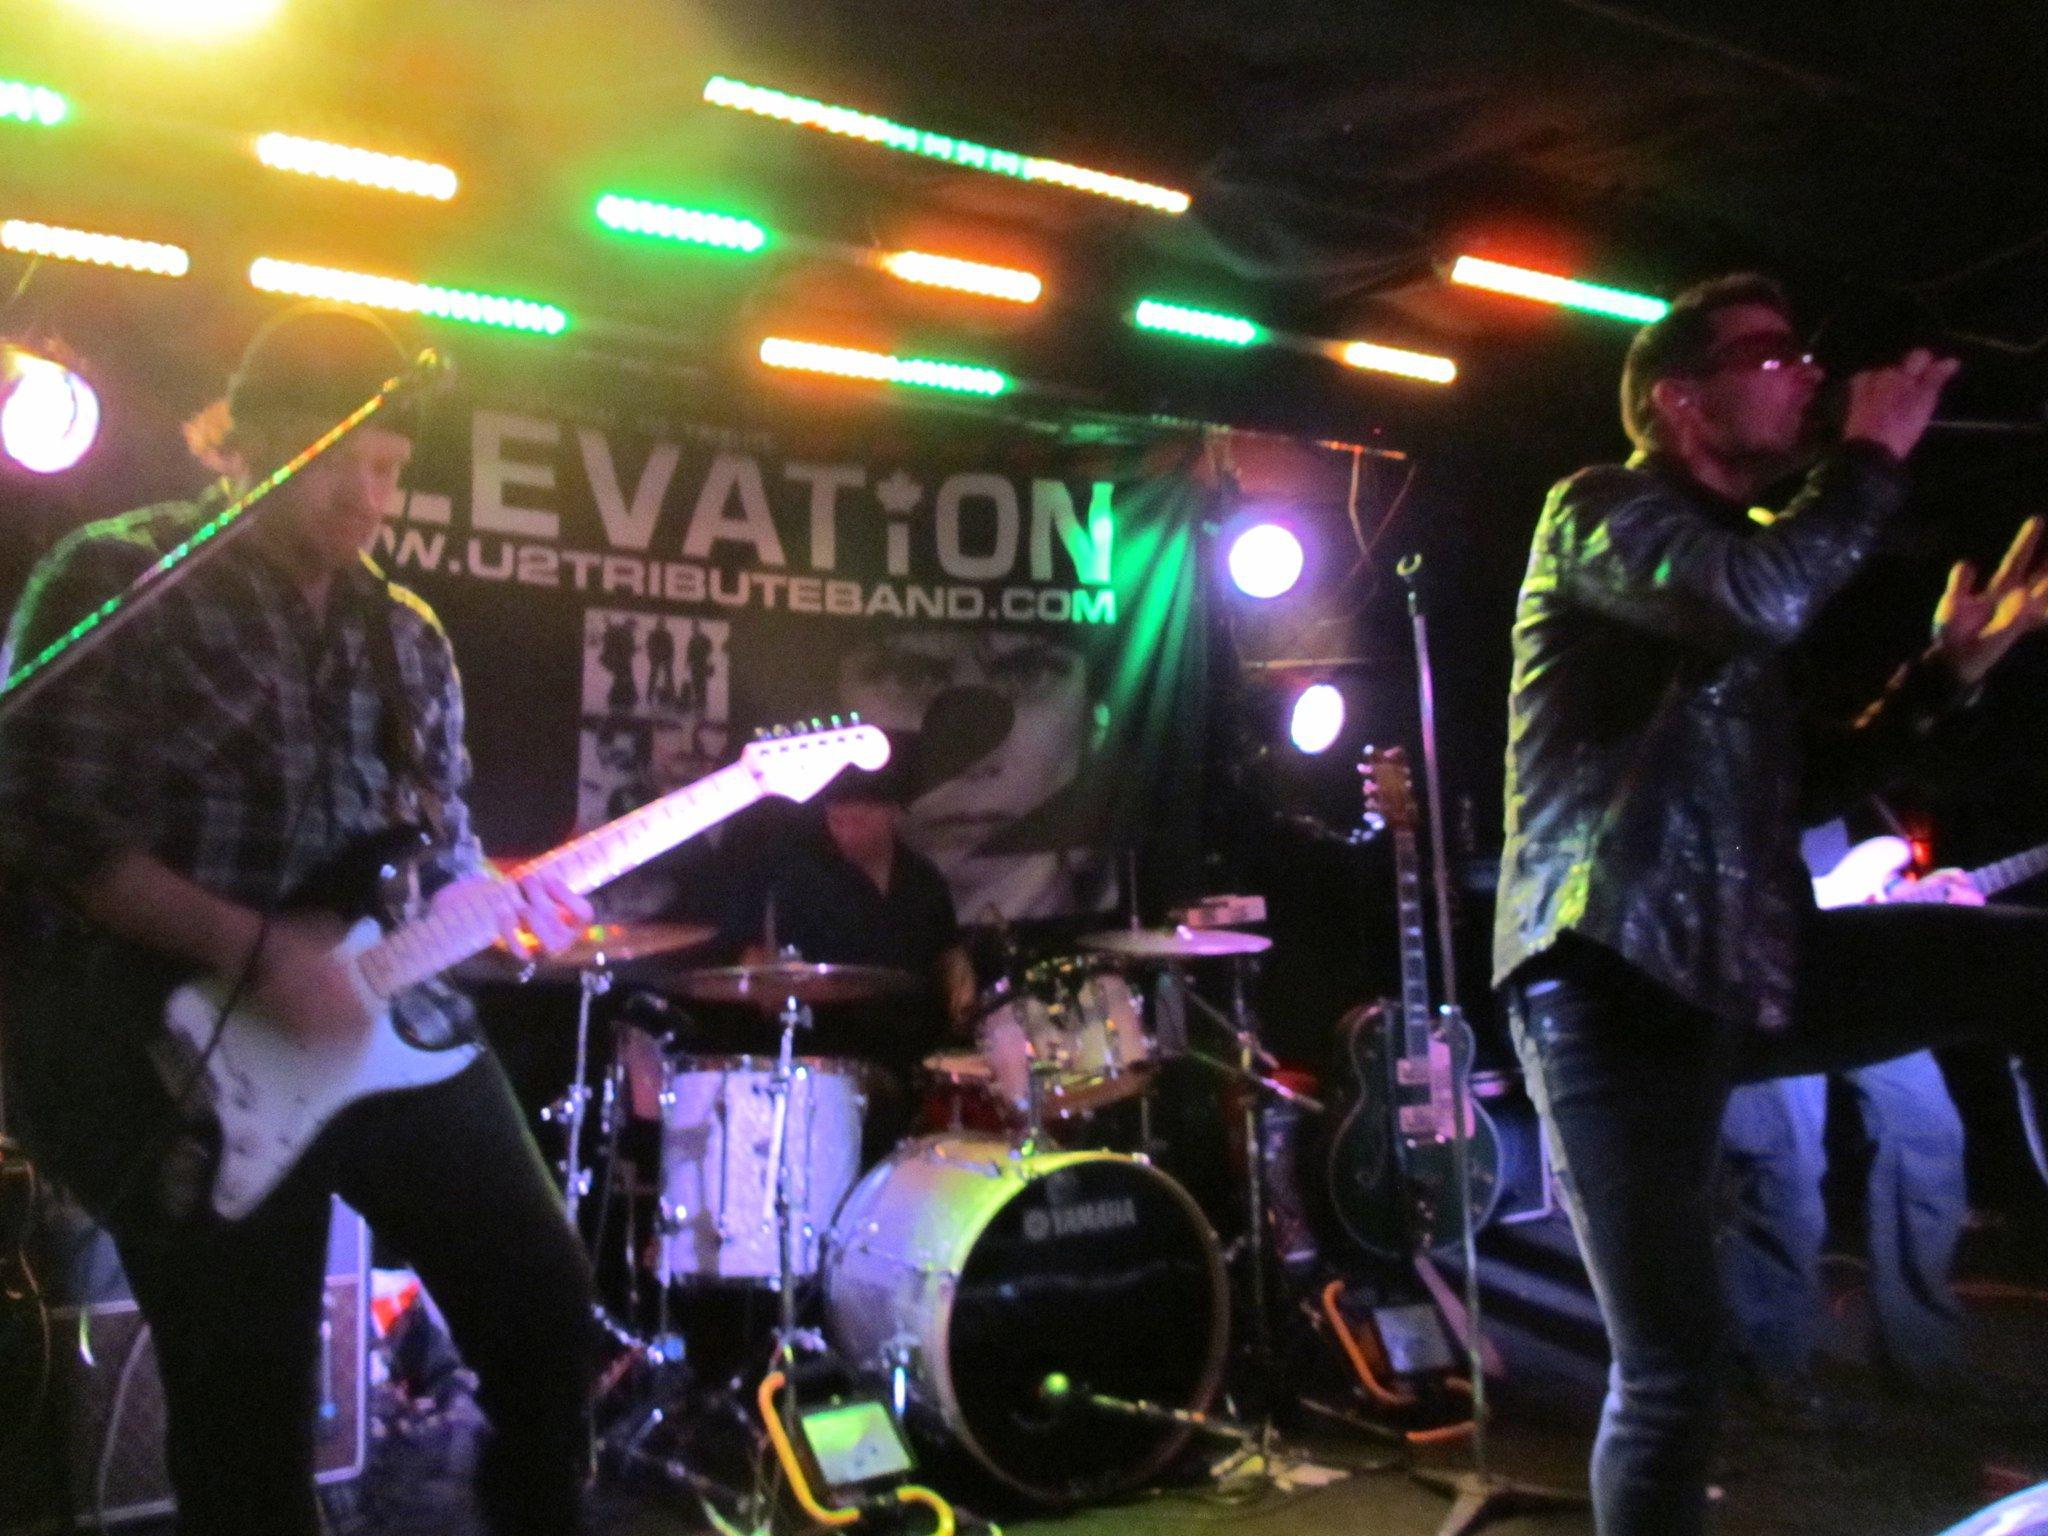 Elevation - 9th Anniversary Show